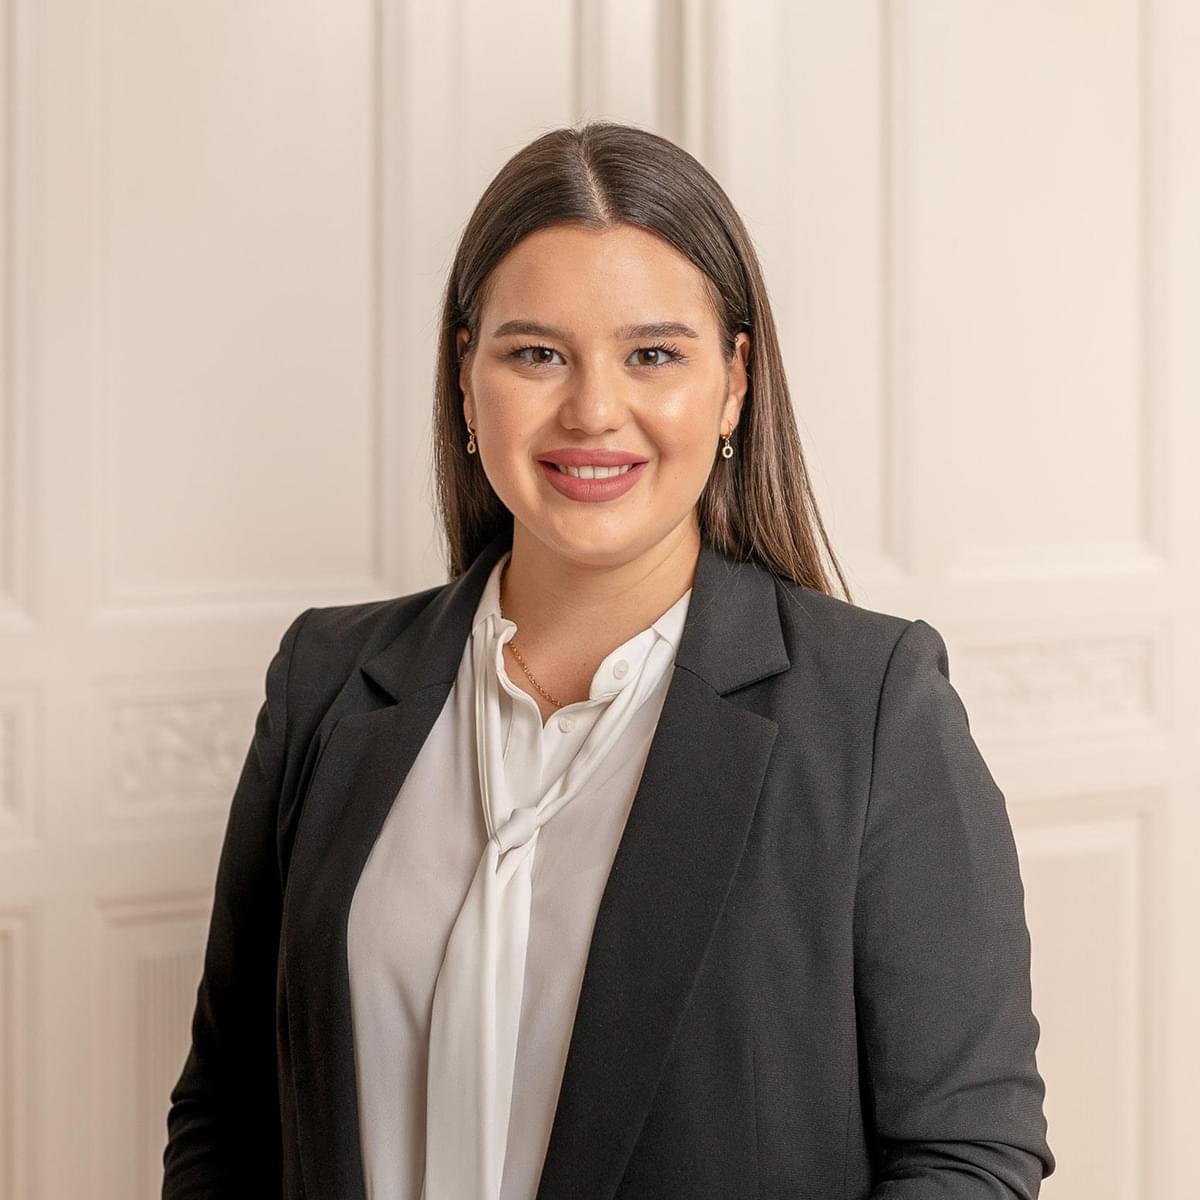 Alicia Müller